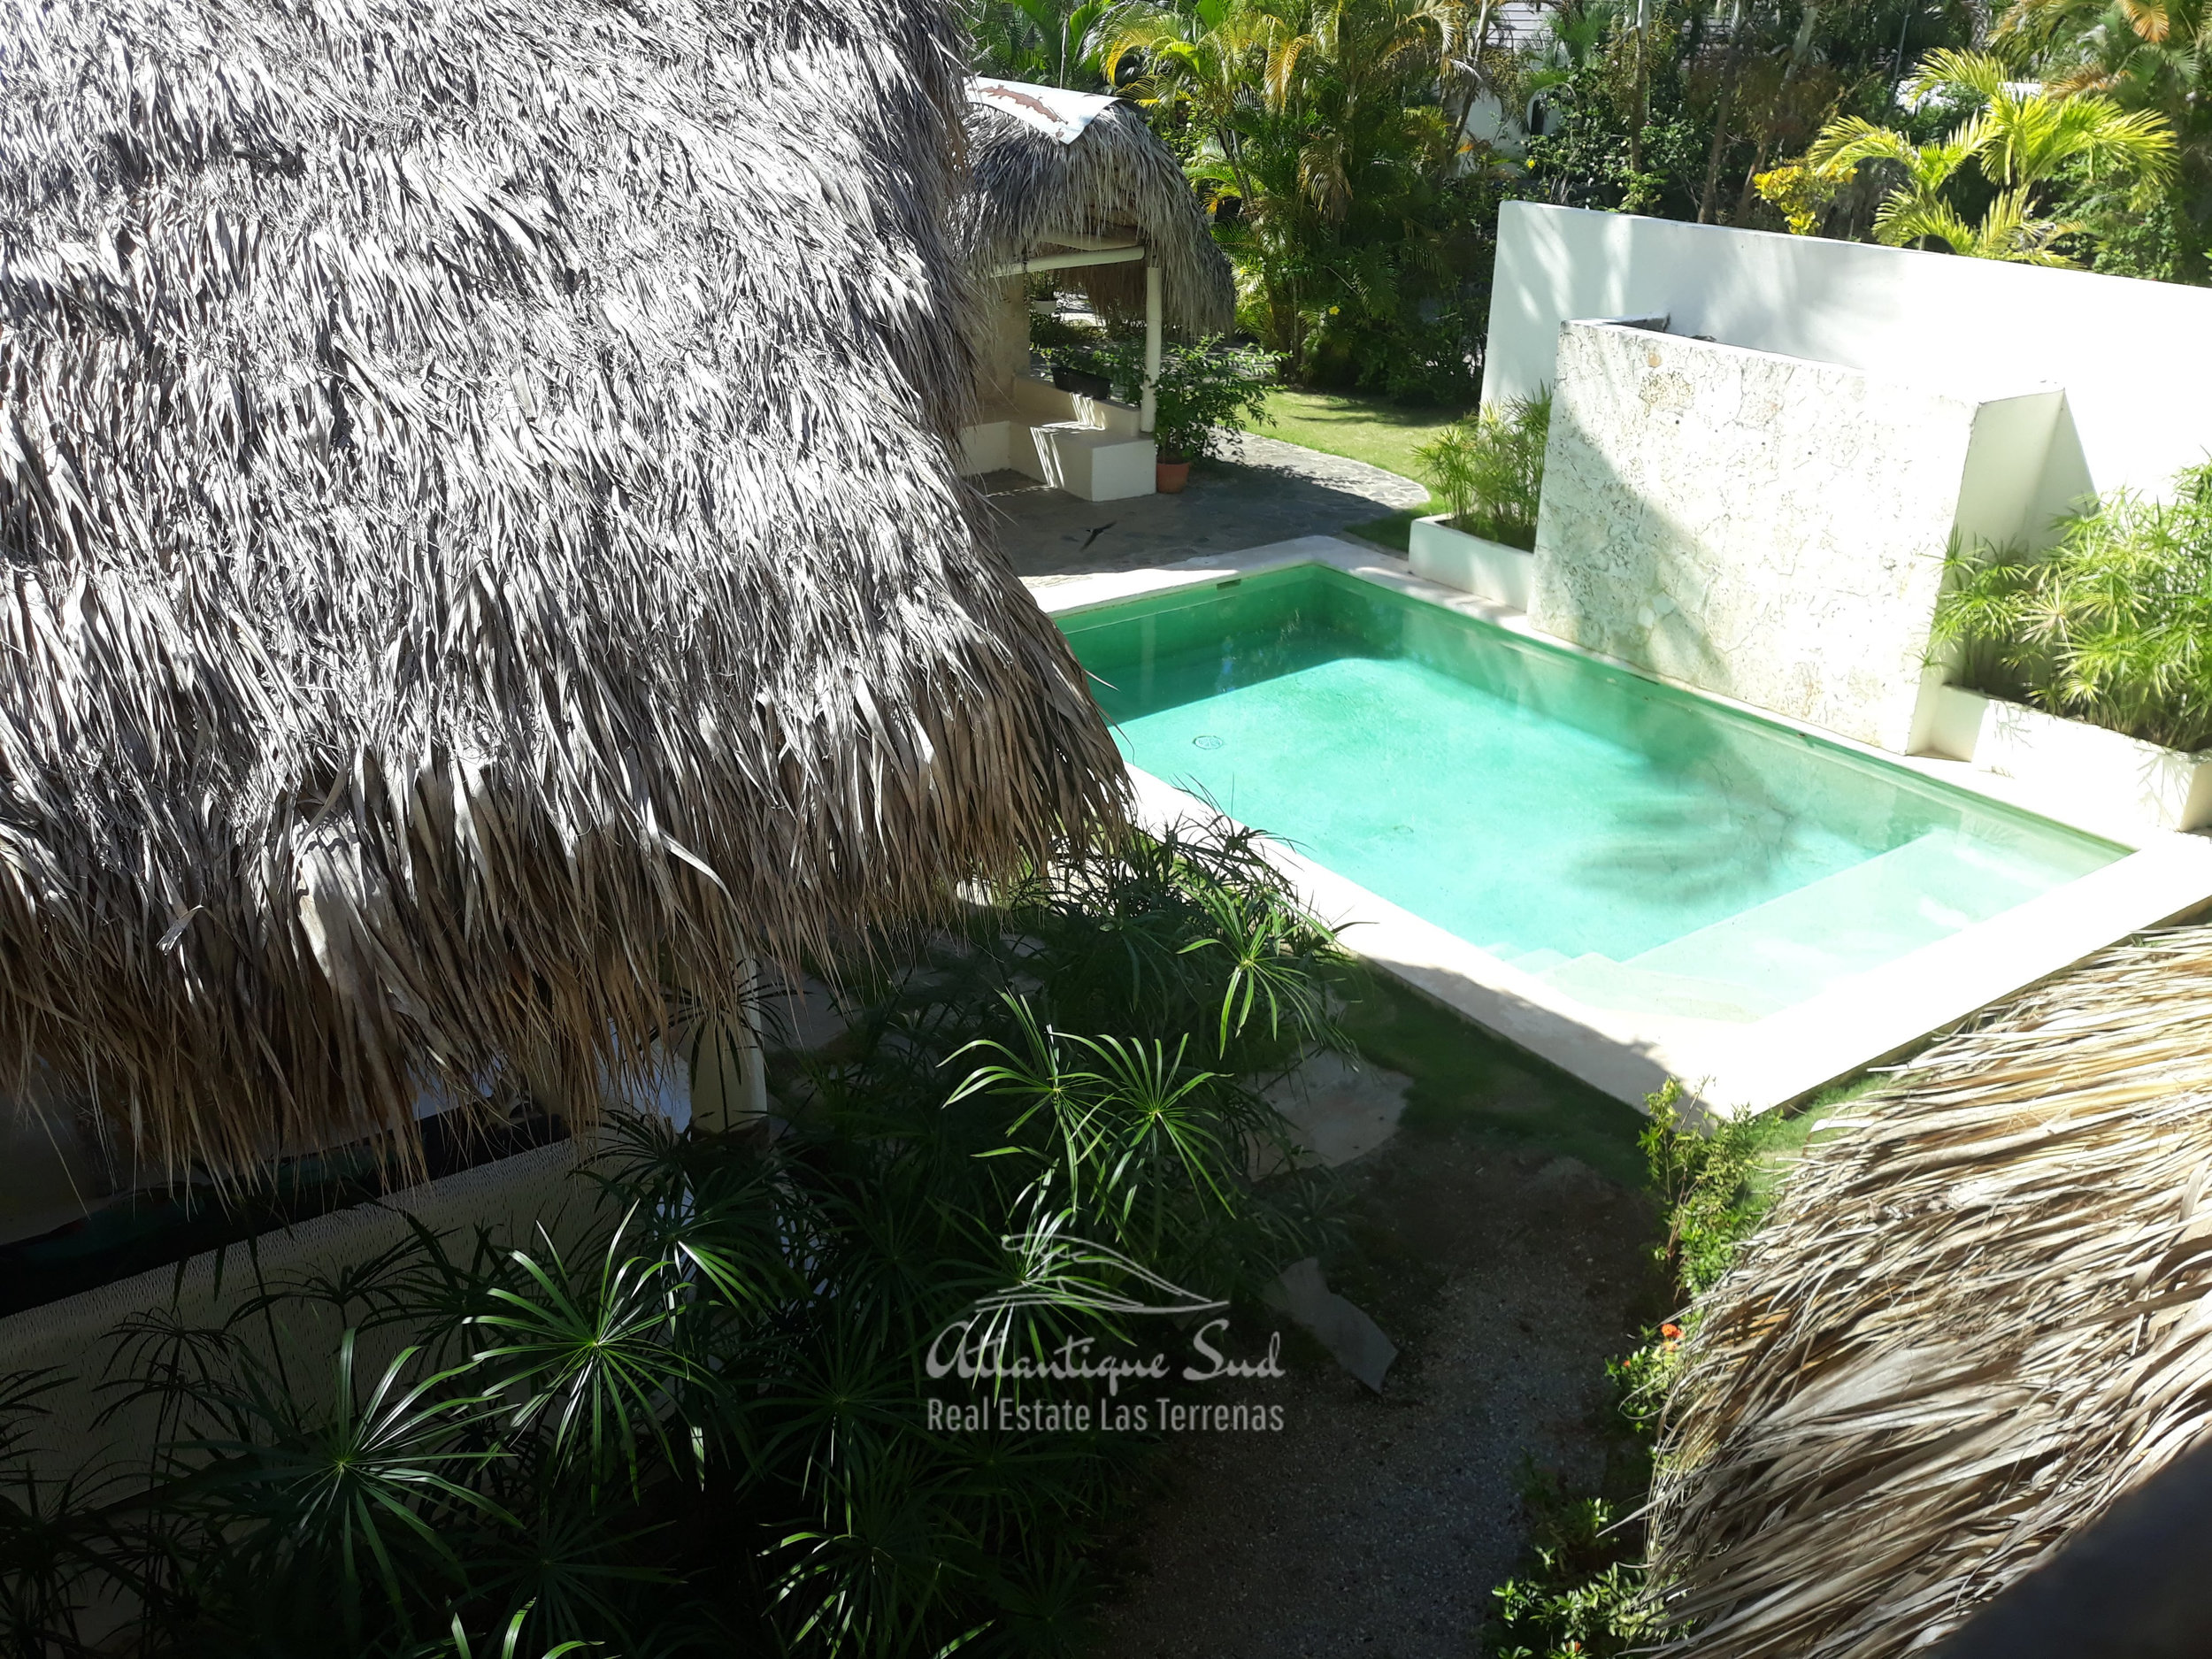 Authentic Caribbean Villa in quiet community in Real Estate Las Terrenas Atlantique Sud18.jpg